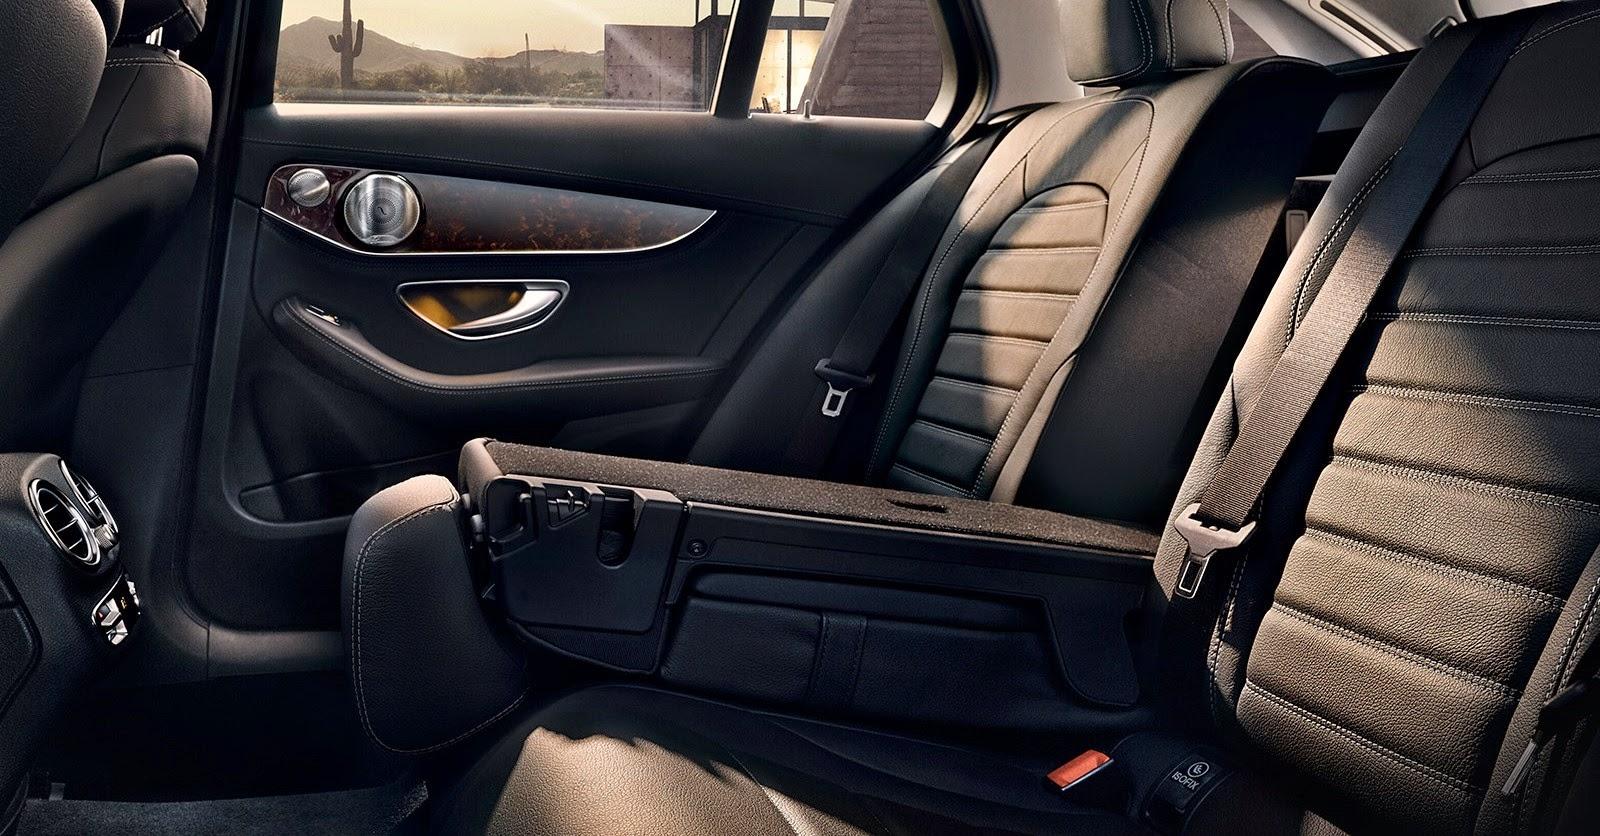 Leopaul 39 s blog mercedes benz c class estate s205 for Mercedes benz c class 2015 interior